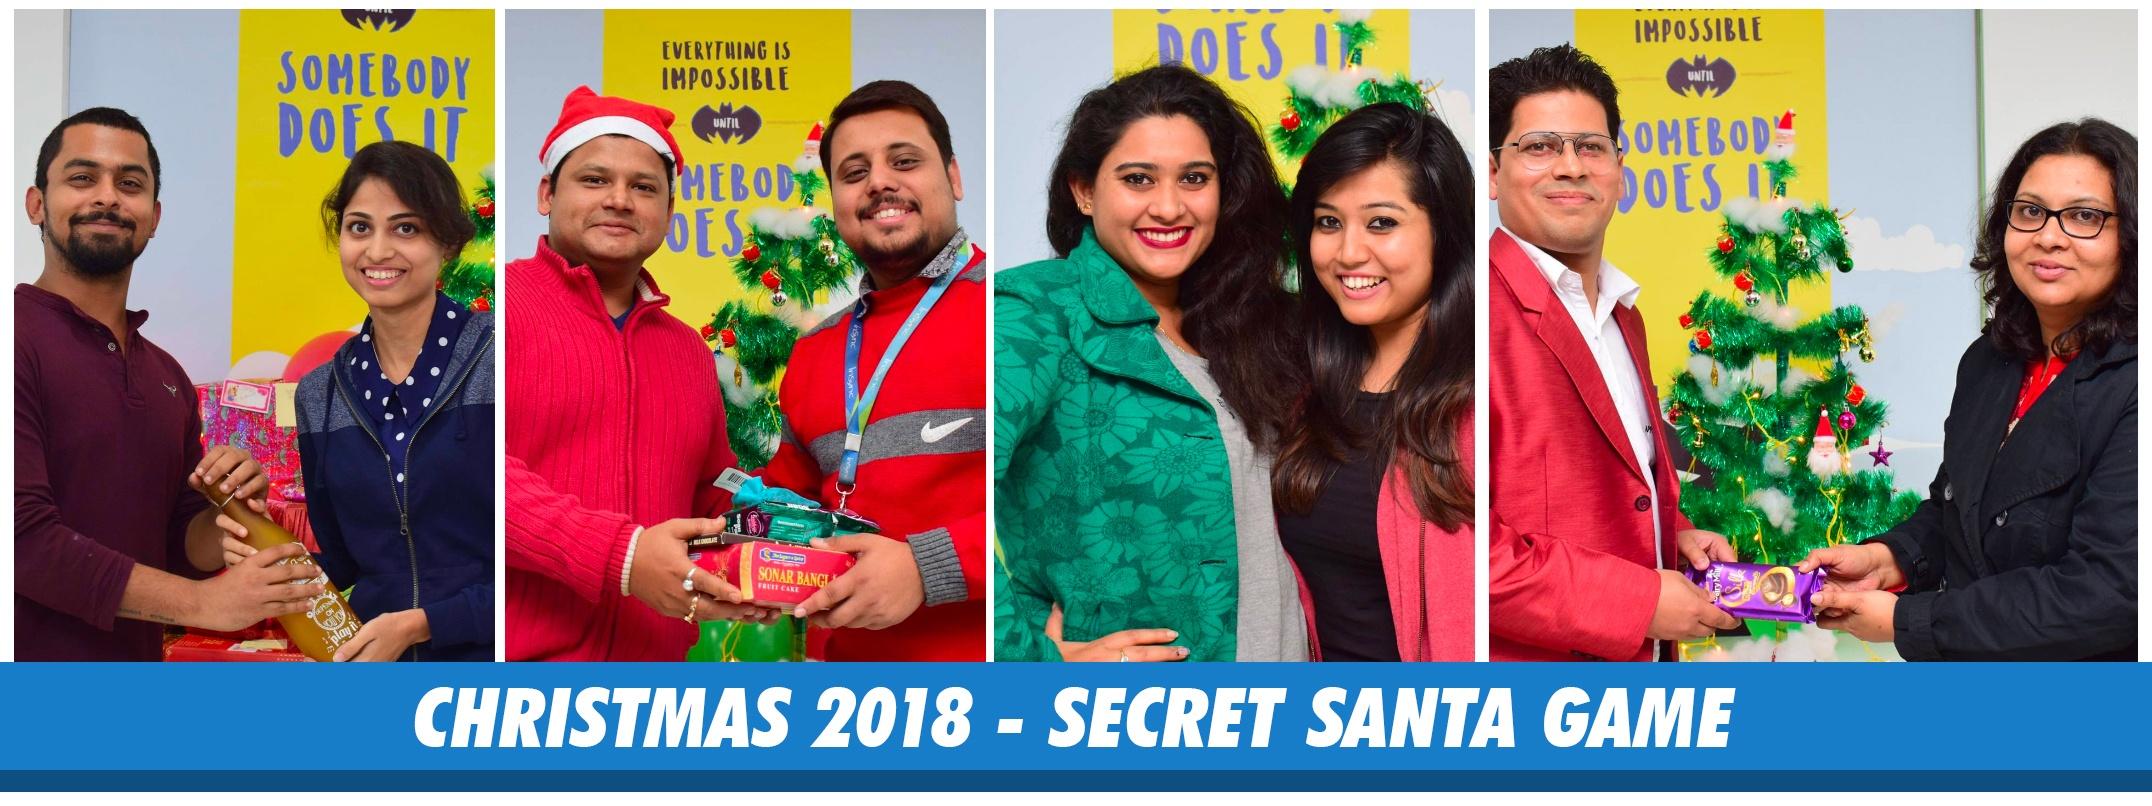 APPSeCONNECT-celebrating-Christmas-2018-secret-santa